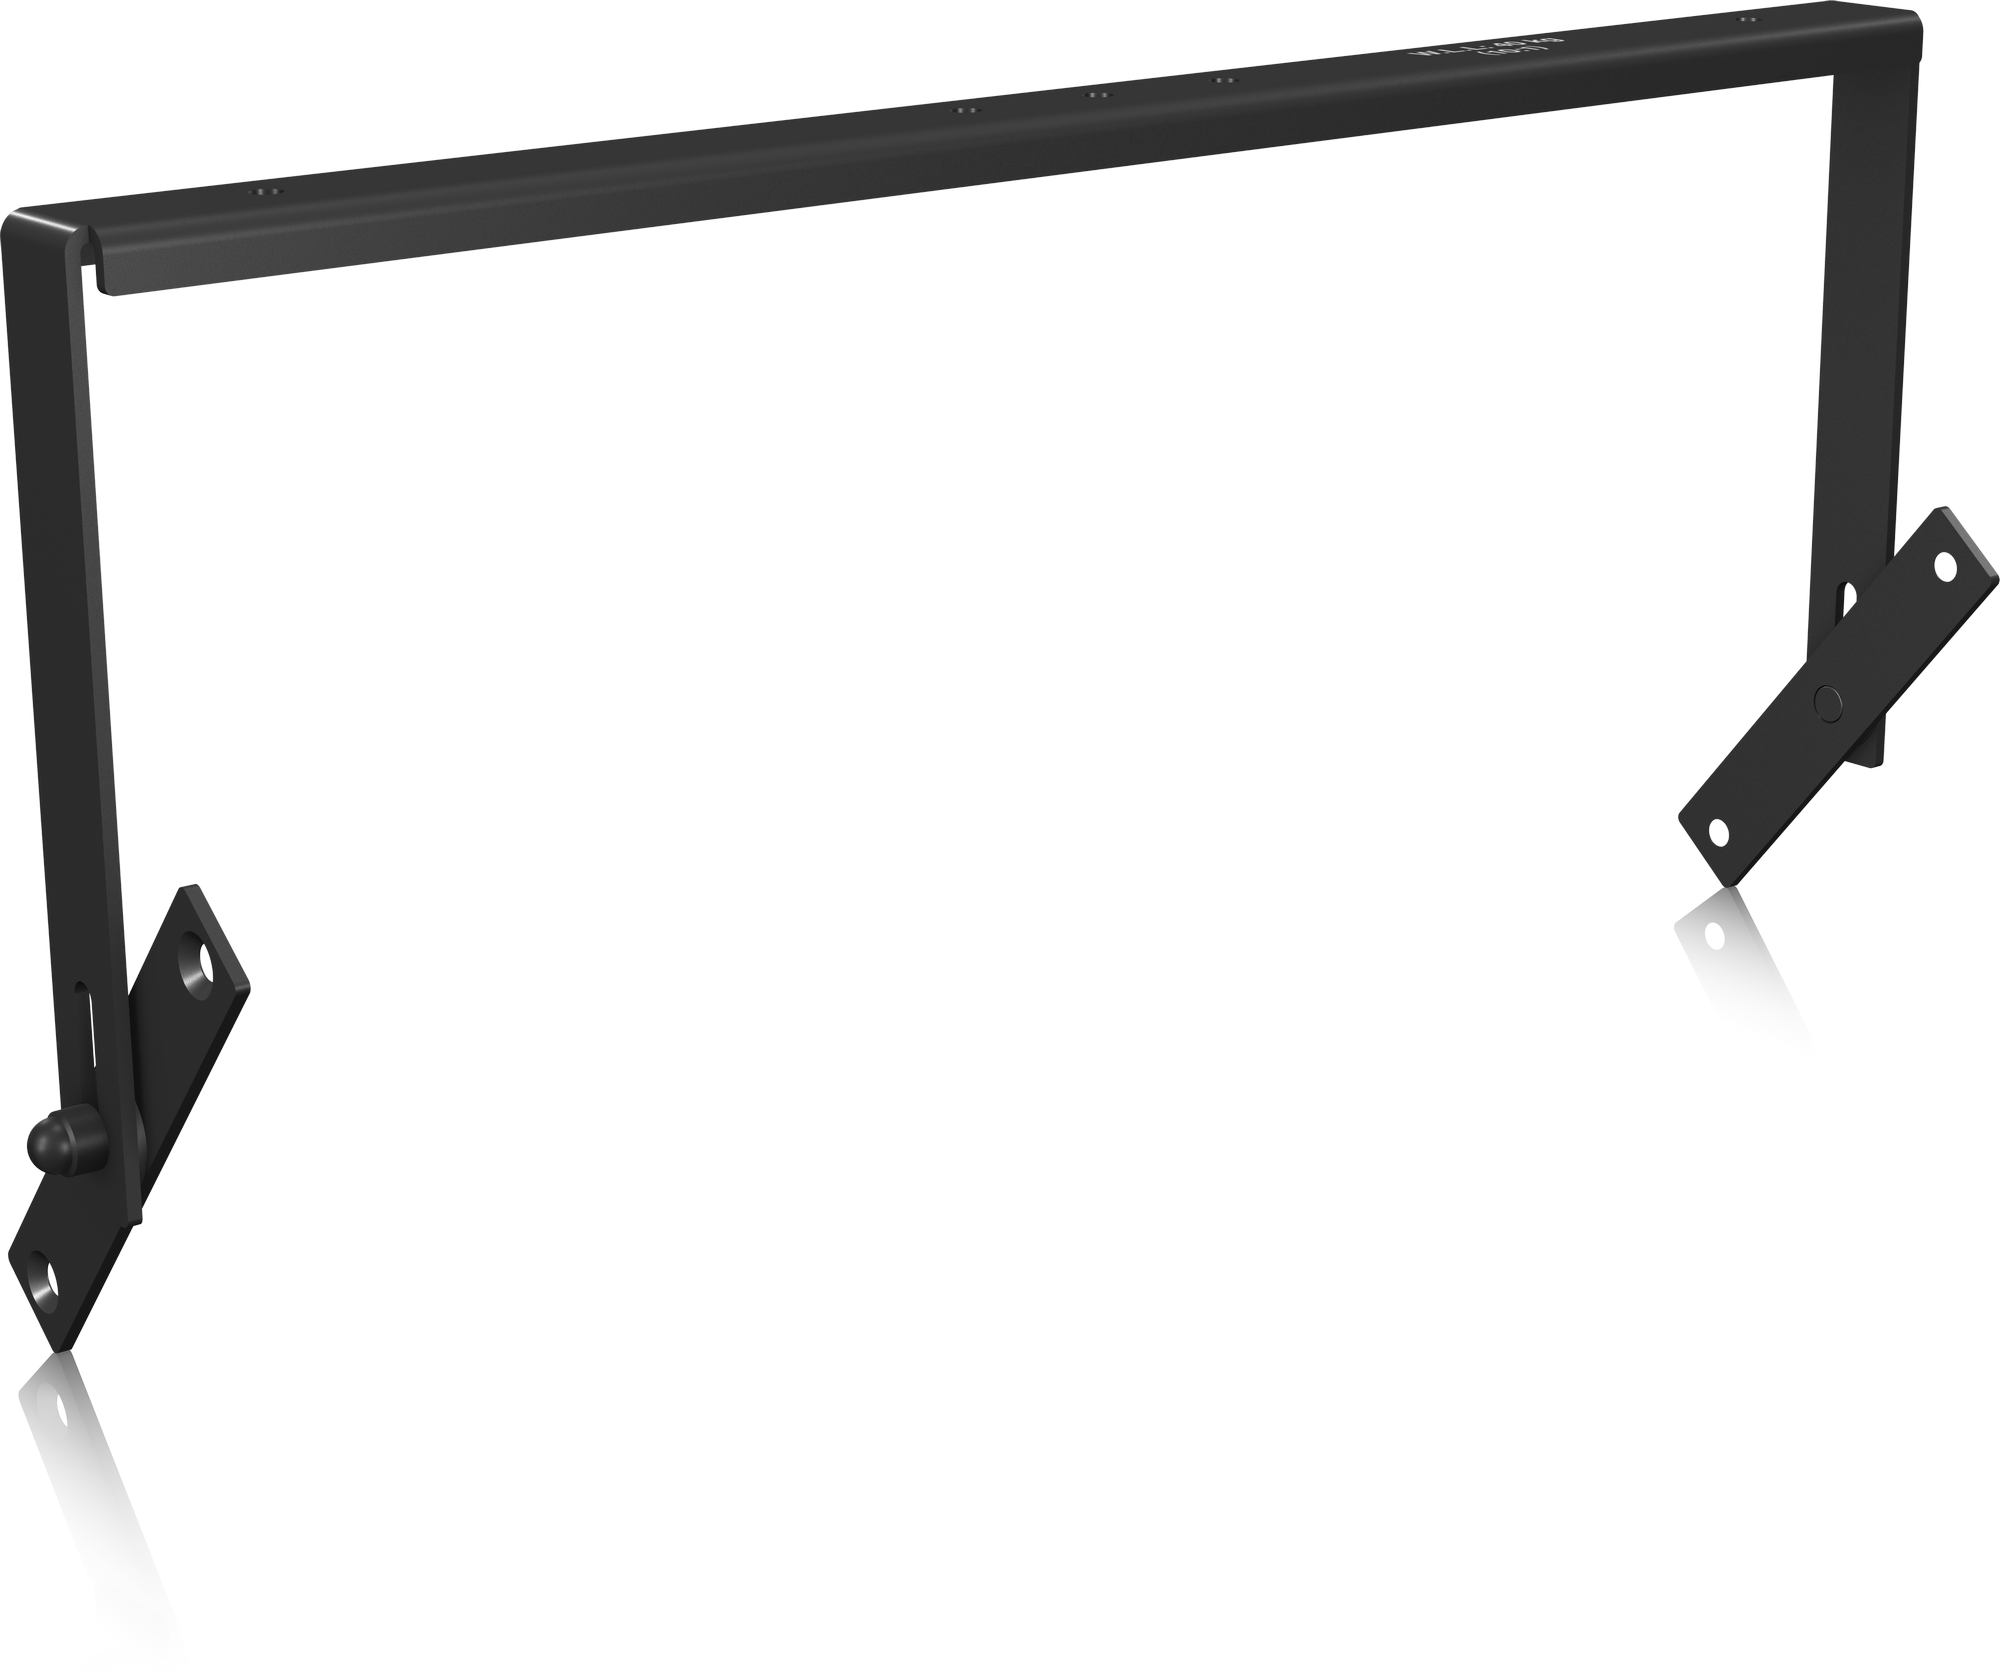 Tannoy  YOKE HORIZONTAL VX 12.2 - Wall bracket